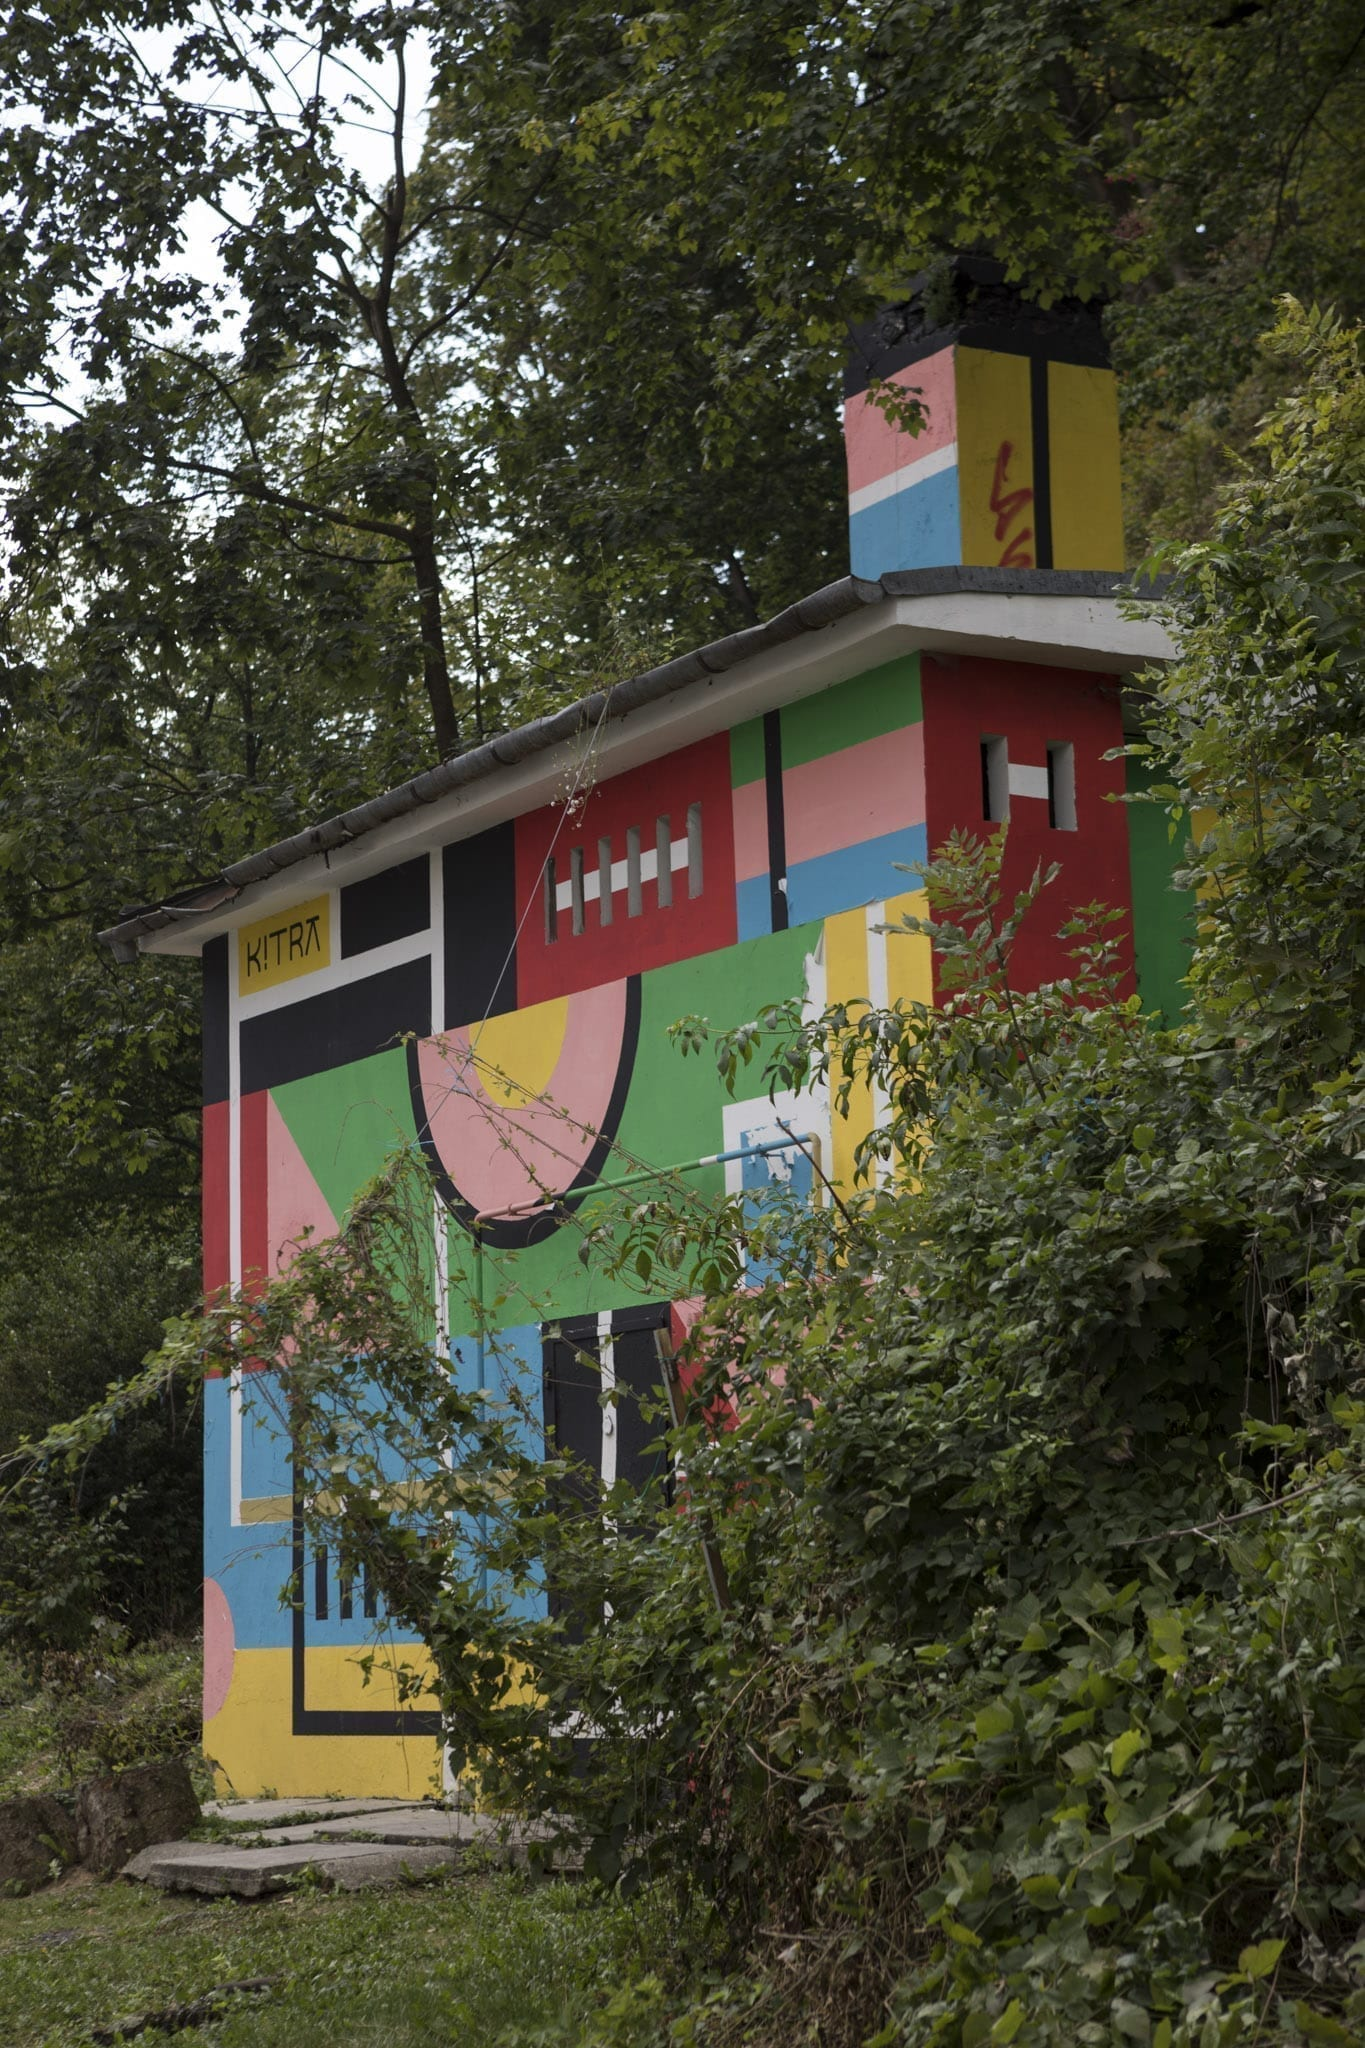 Kitra Amural 2017 Brasov Un-hidden street art in Romania